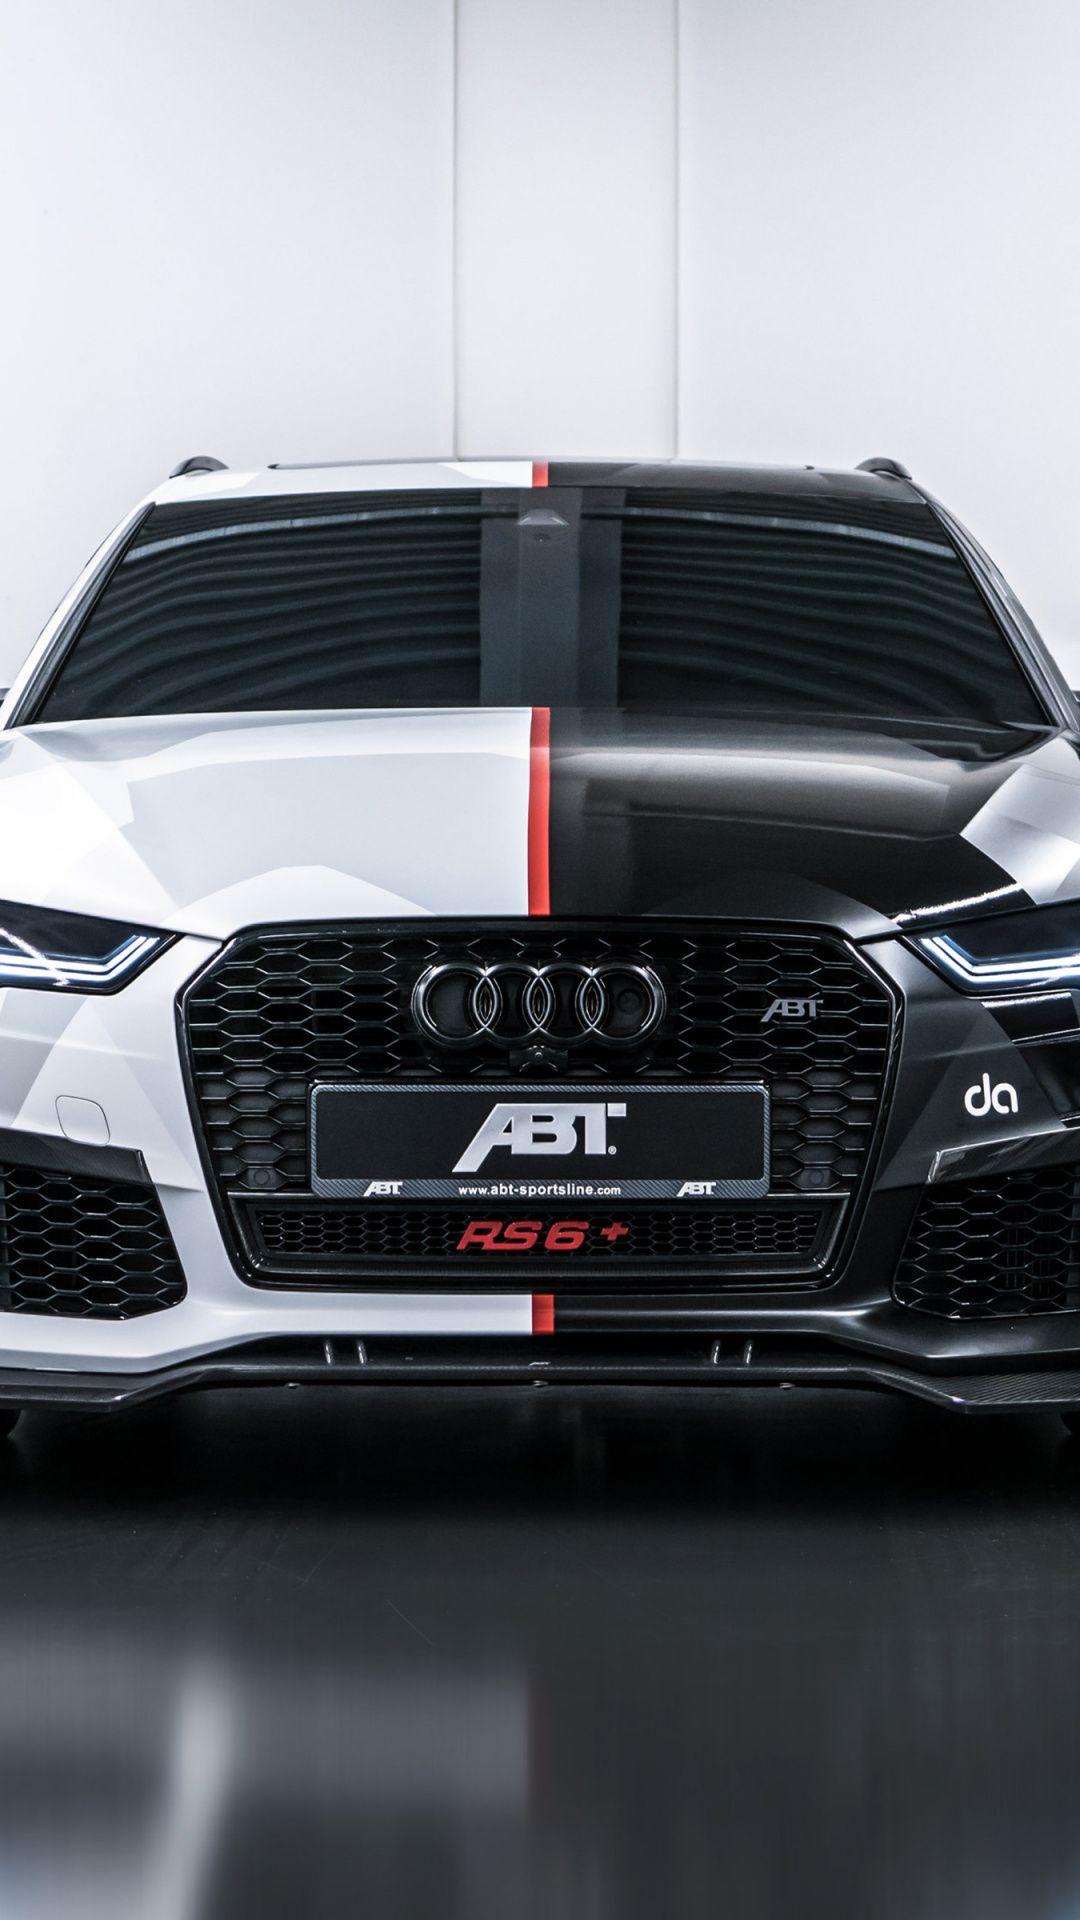 2018 Abt Audi Rs6 Avant Jon Olsson 1080x1920 Wallpaper Audi Rs6 Audi Rs6 Wallpapers Audi